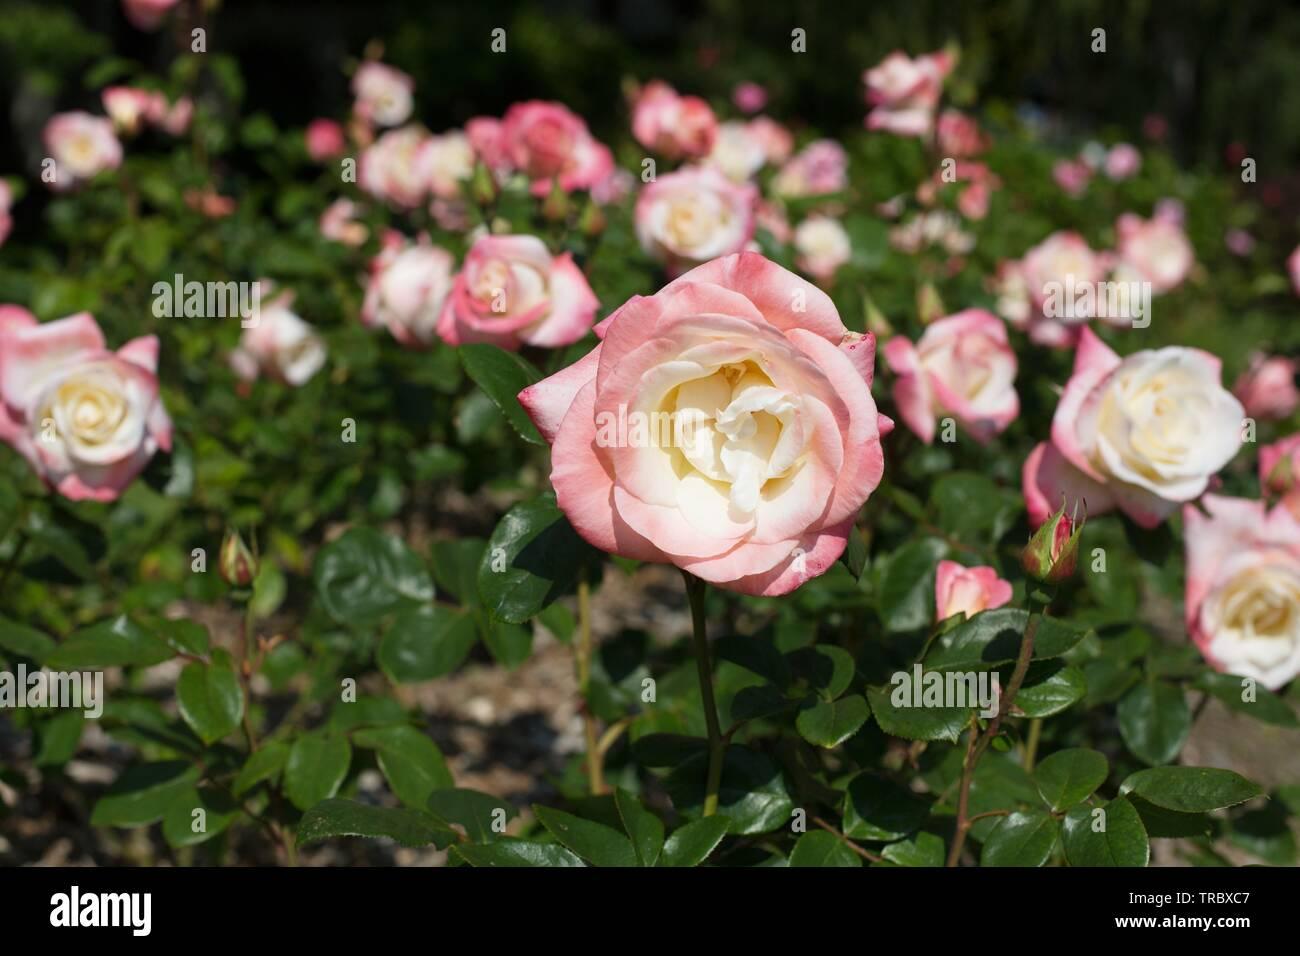 Hybrid Tea Roses Stock Photos Hybrid Tea Roses Stock Images Alamy